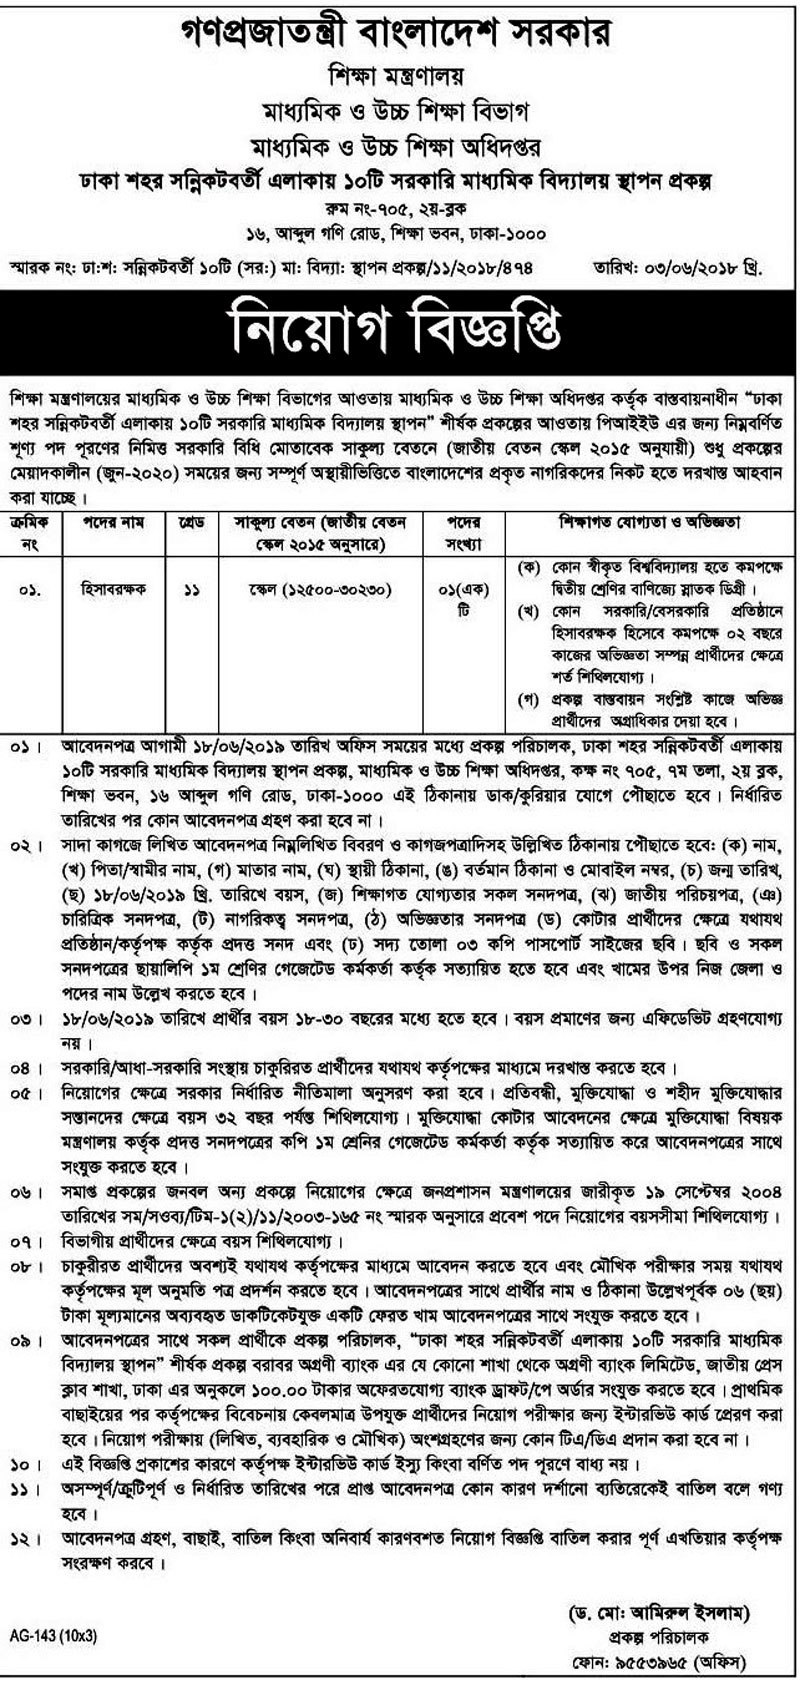 Education Ministry Job 2019